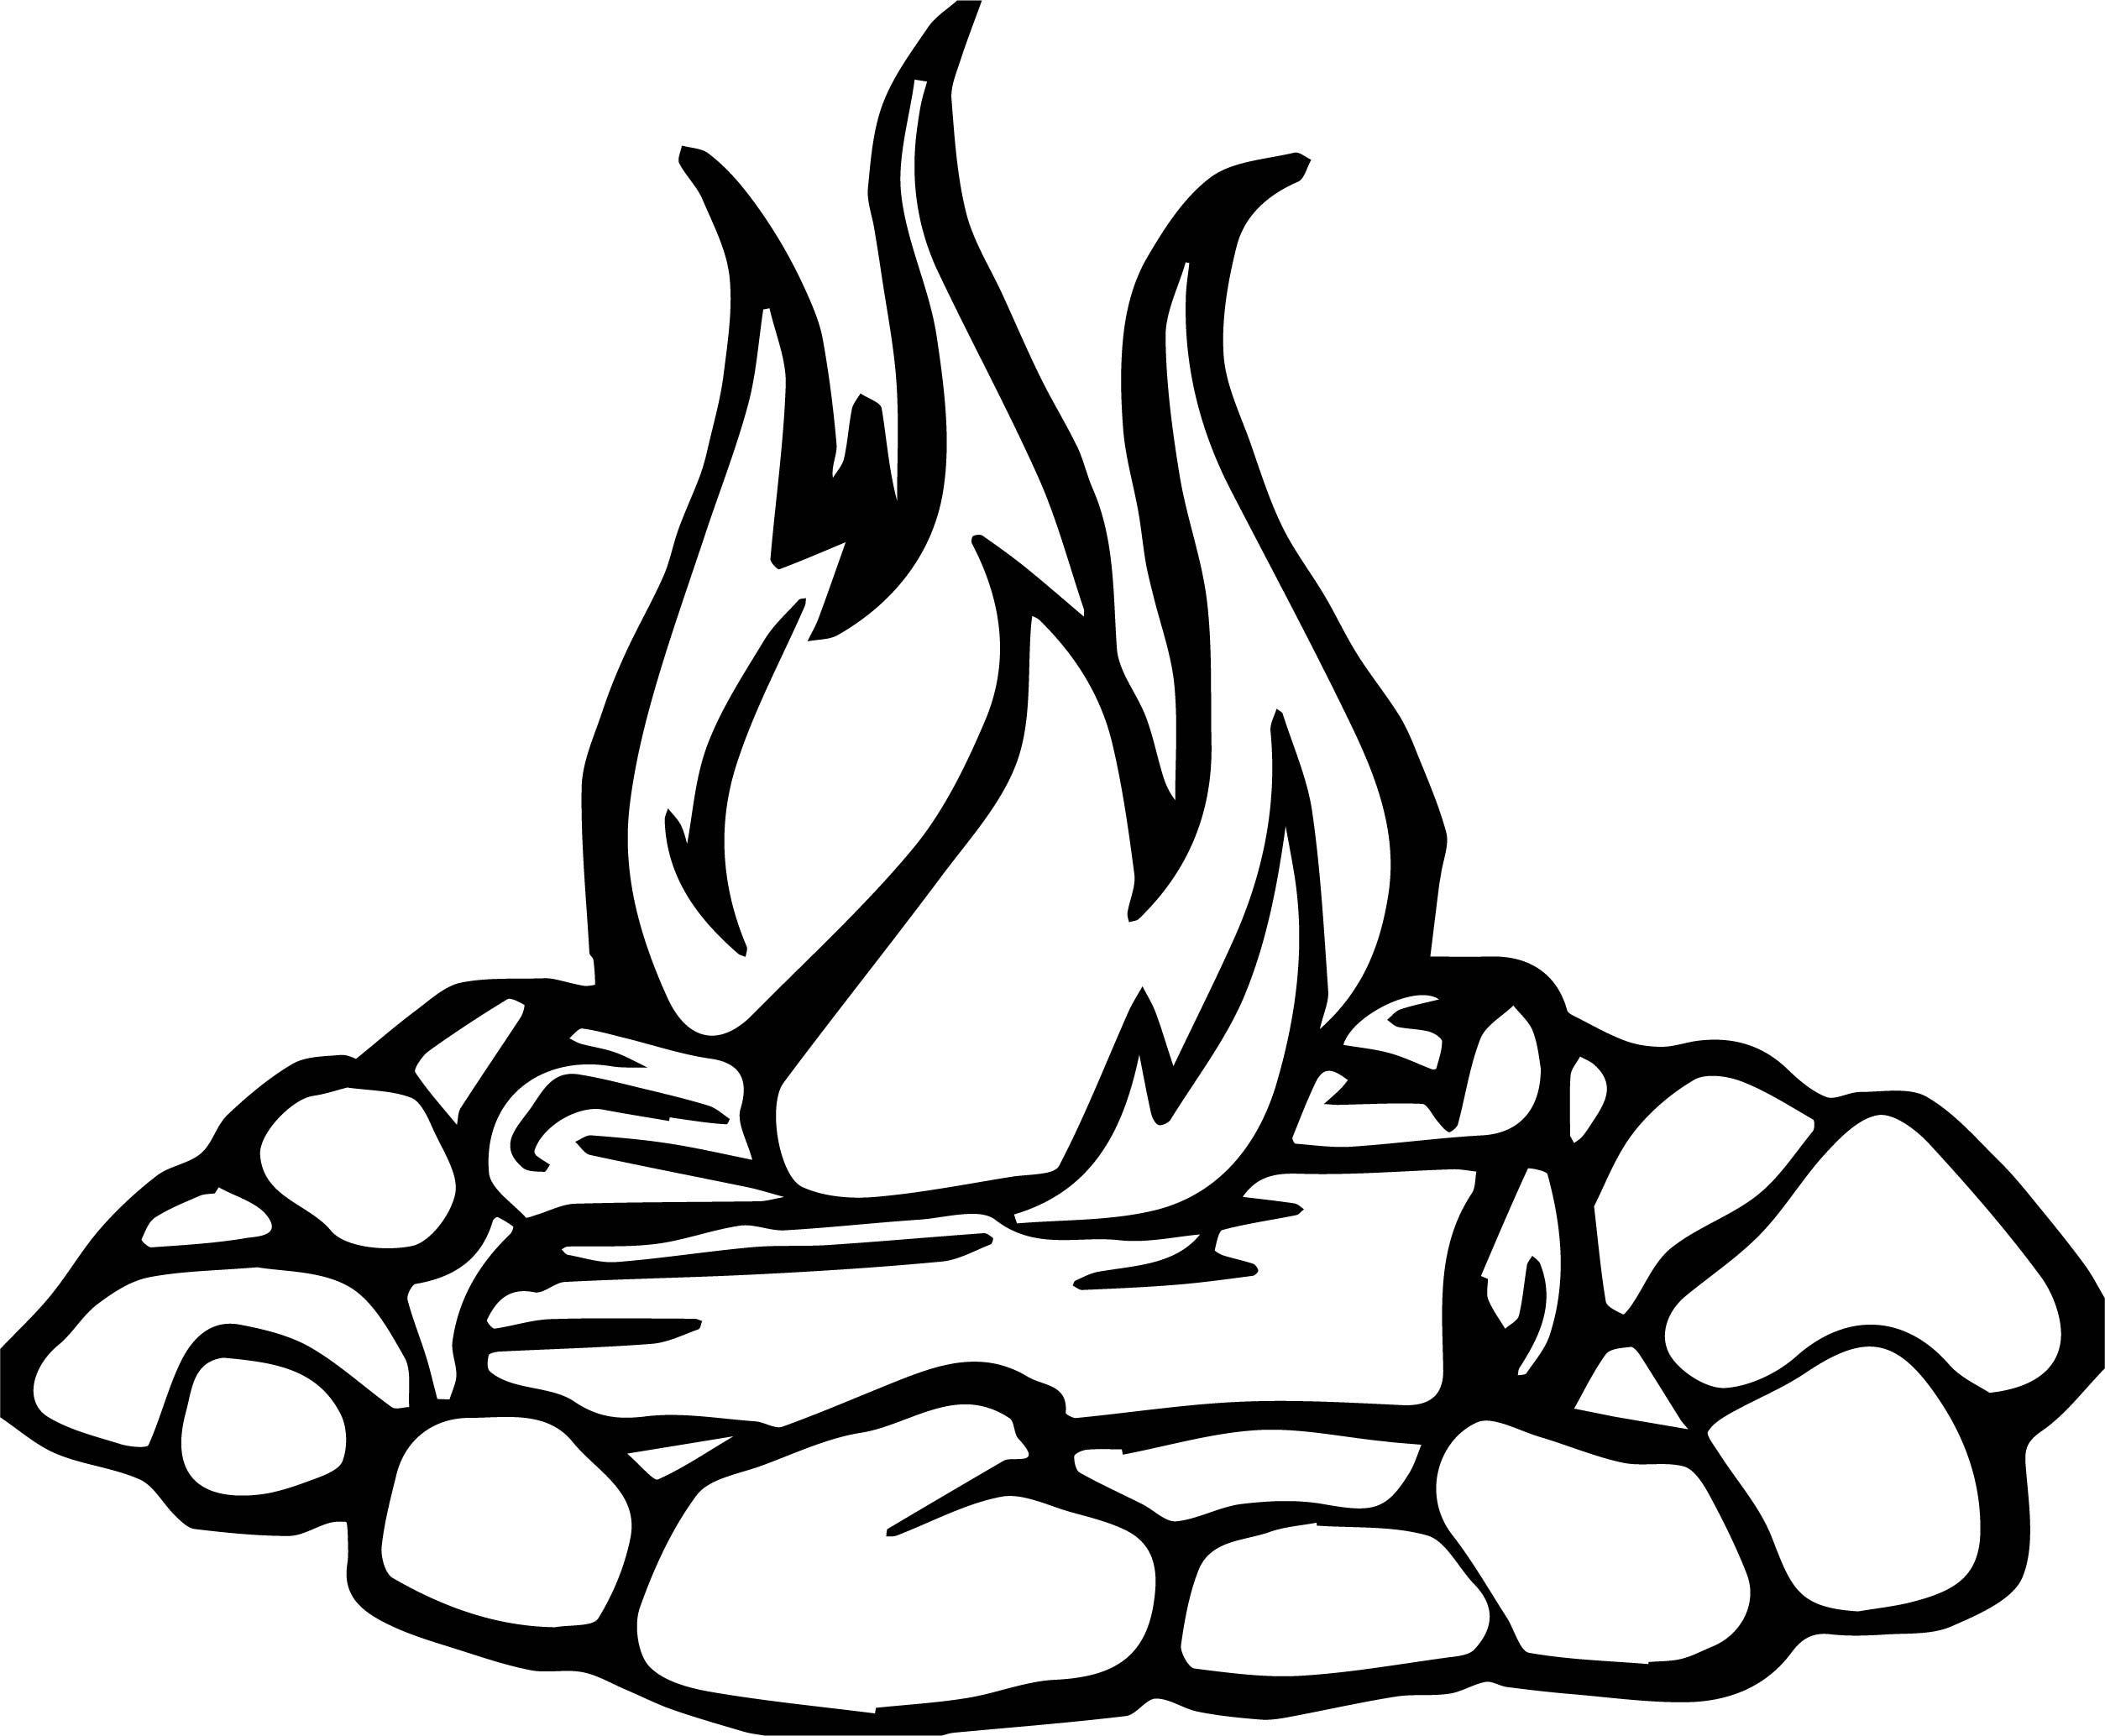 Camping Make Campfire When Camping Coloring Page Camping